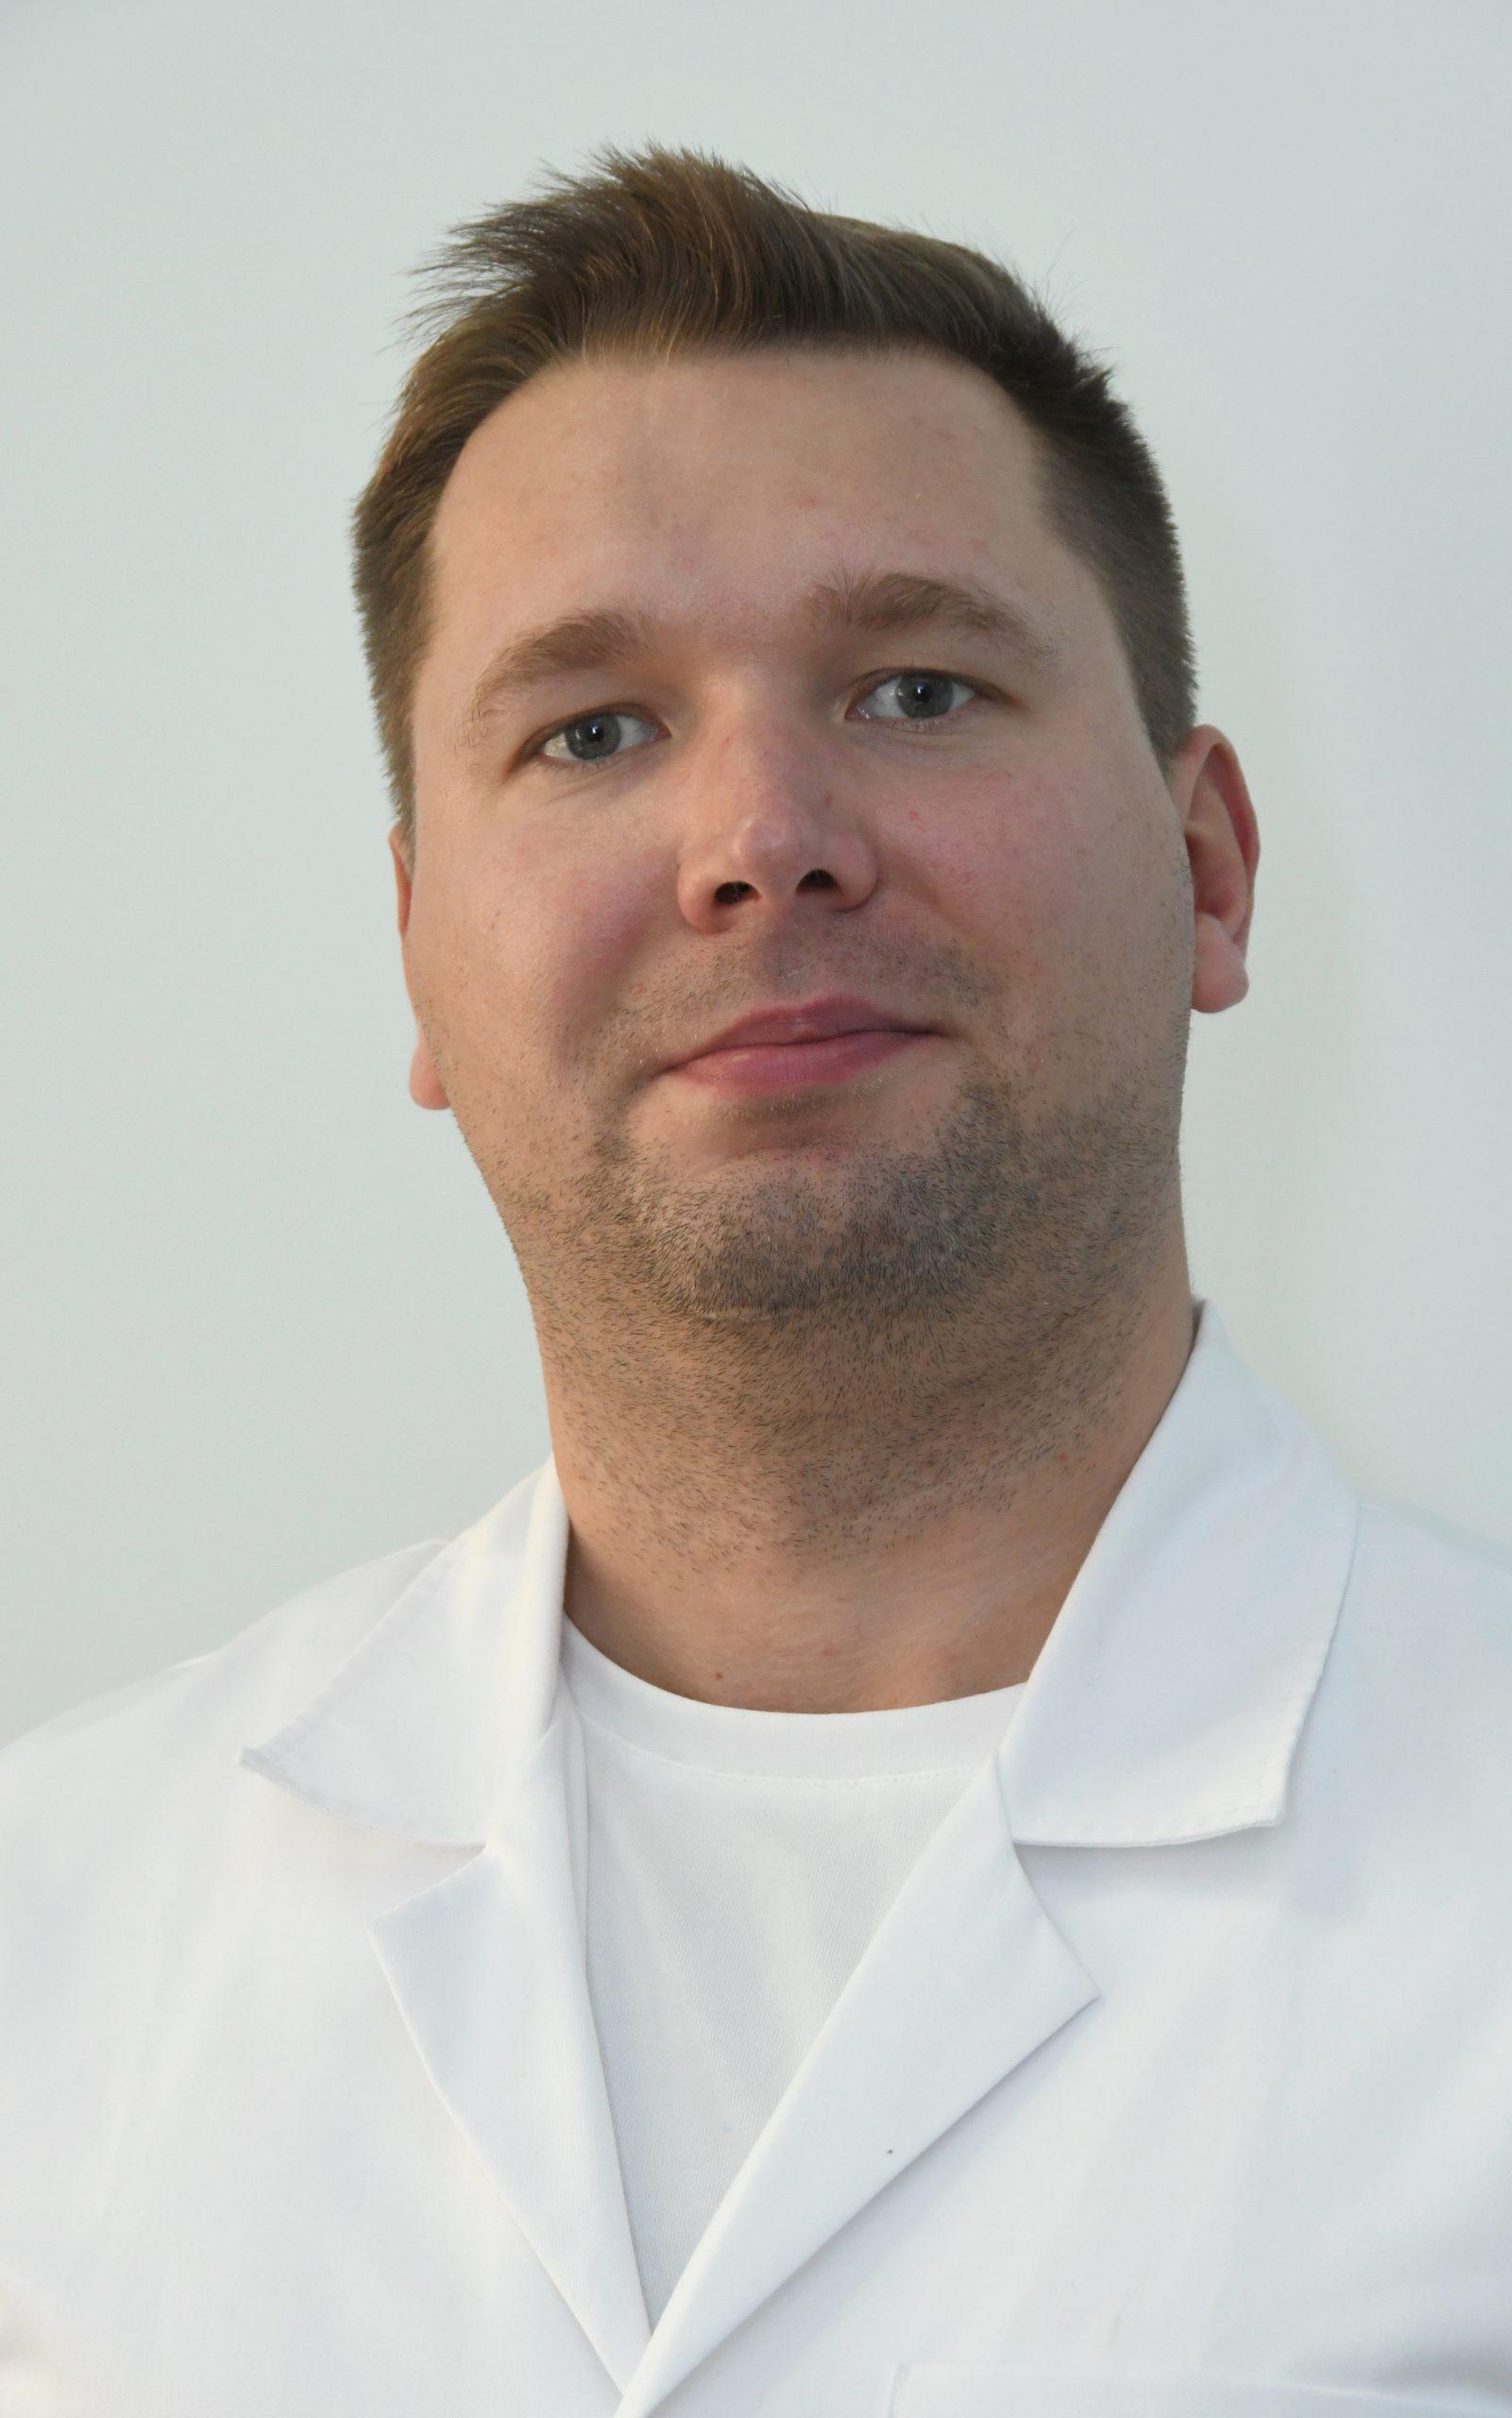 Fizjoterapia – zabiegi fizjoterapii